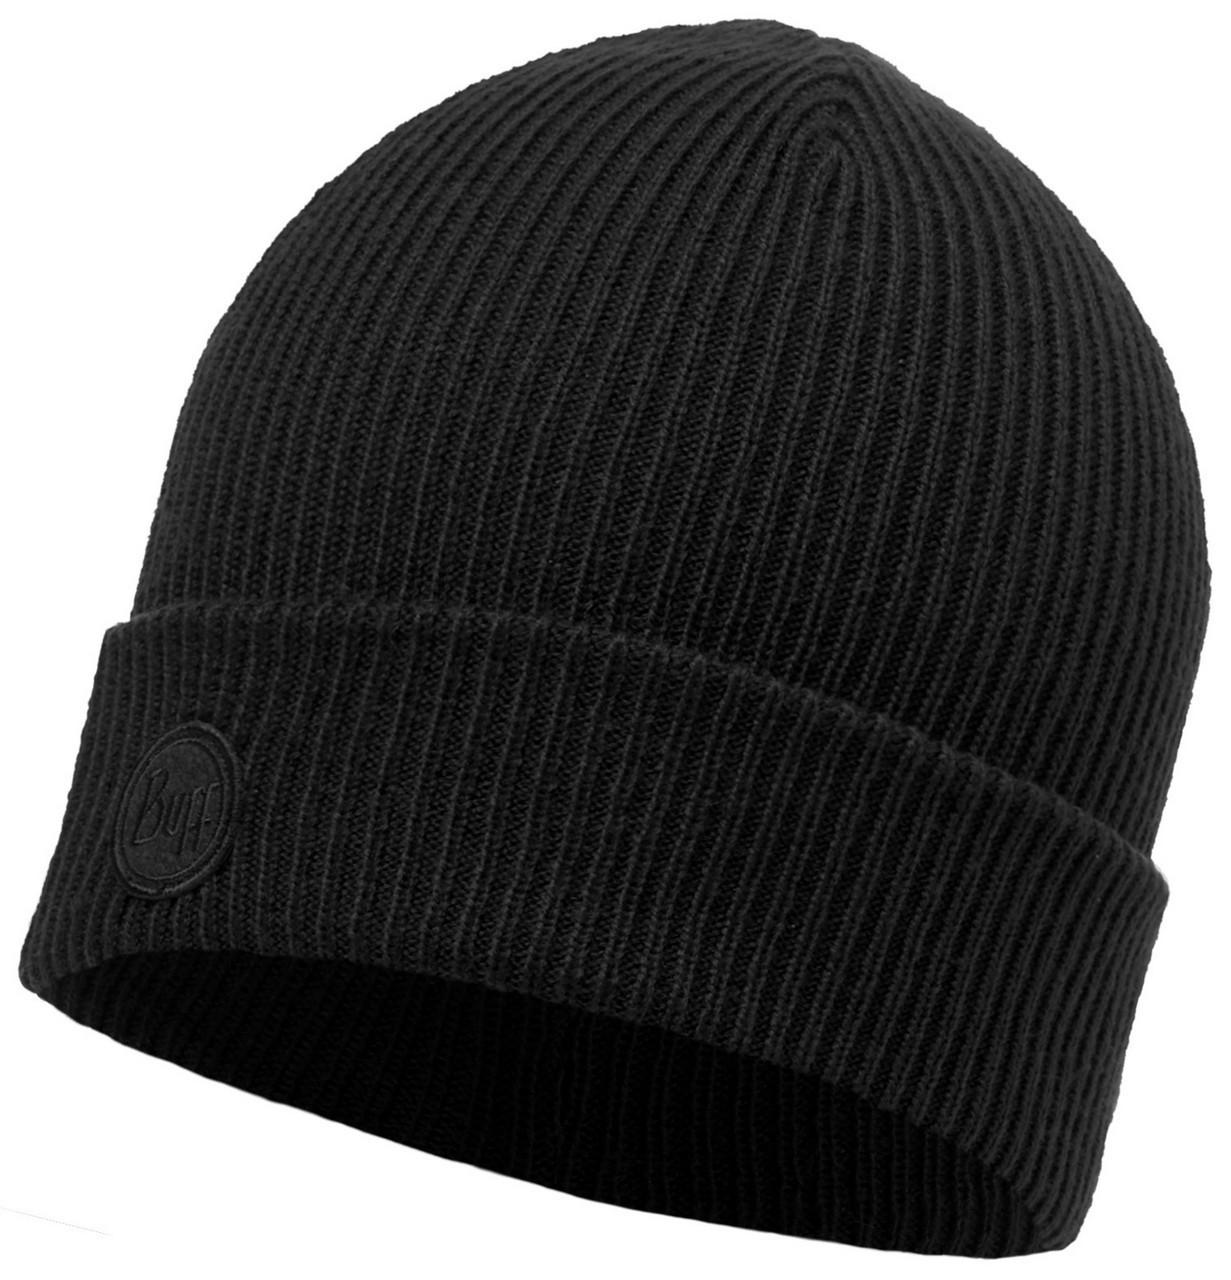 Шапки с отворотом Вязаная шапка Buff Edsel Black 116027.999.10.00.jpg